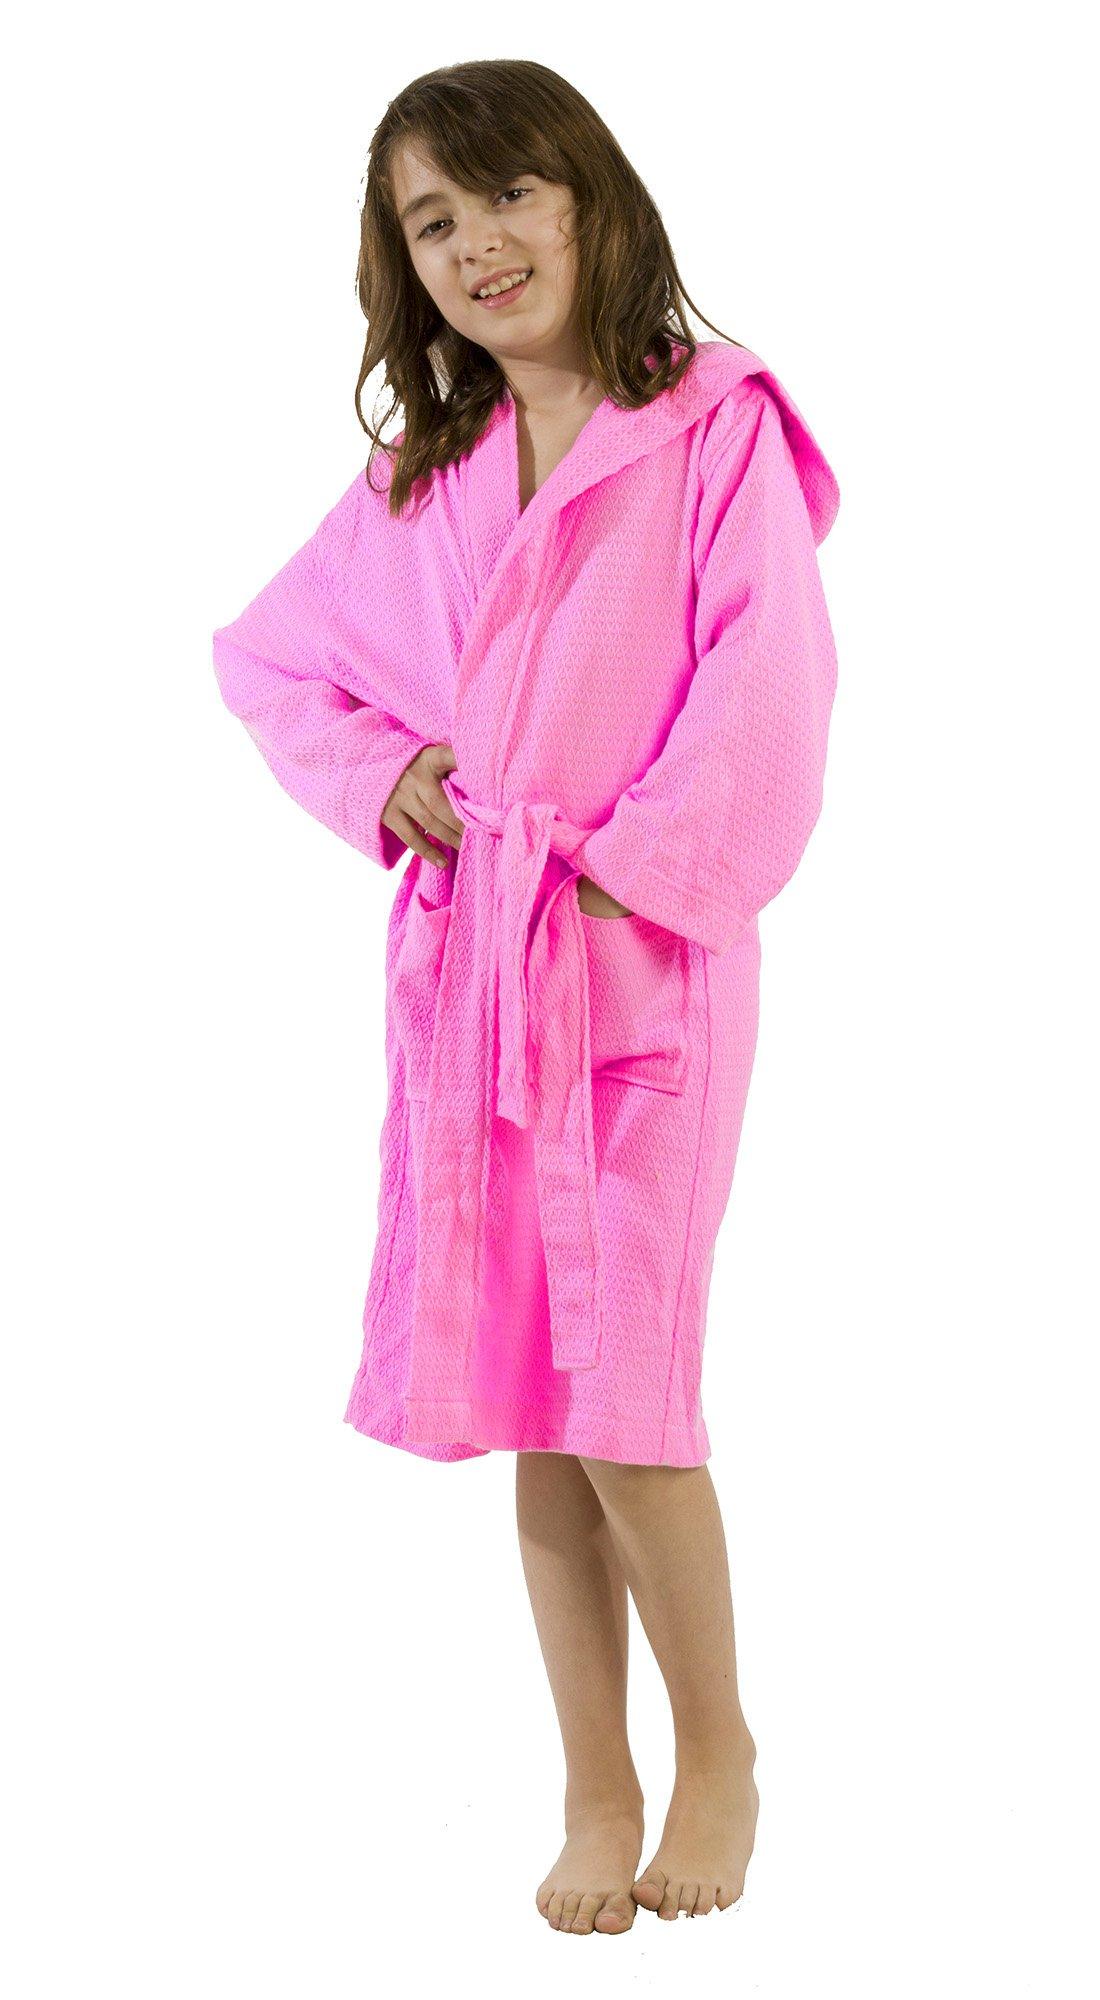 Hooded Kid's Bathrobe, Bamboo Robe for Boys and Girls, Size Medium, Pink Robe